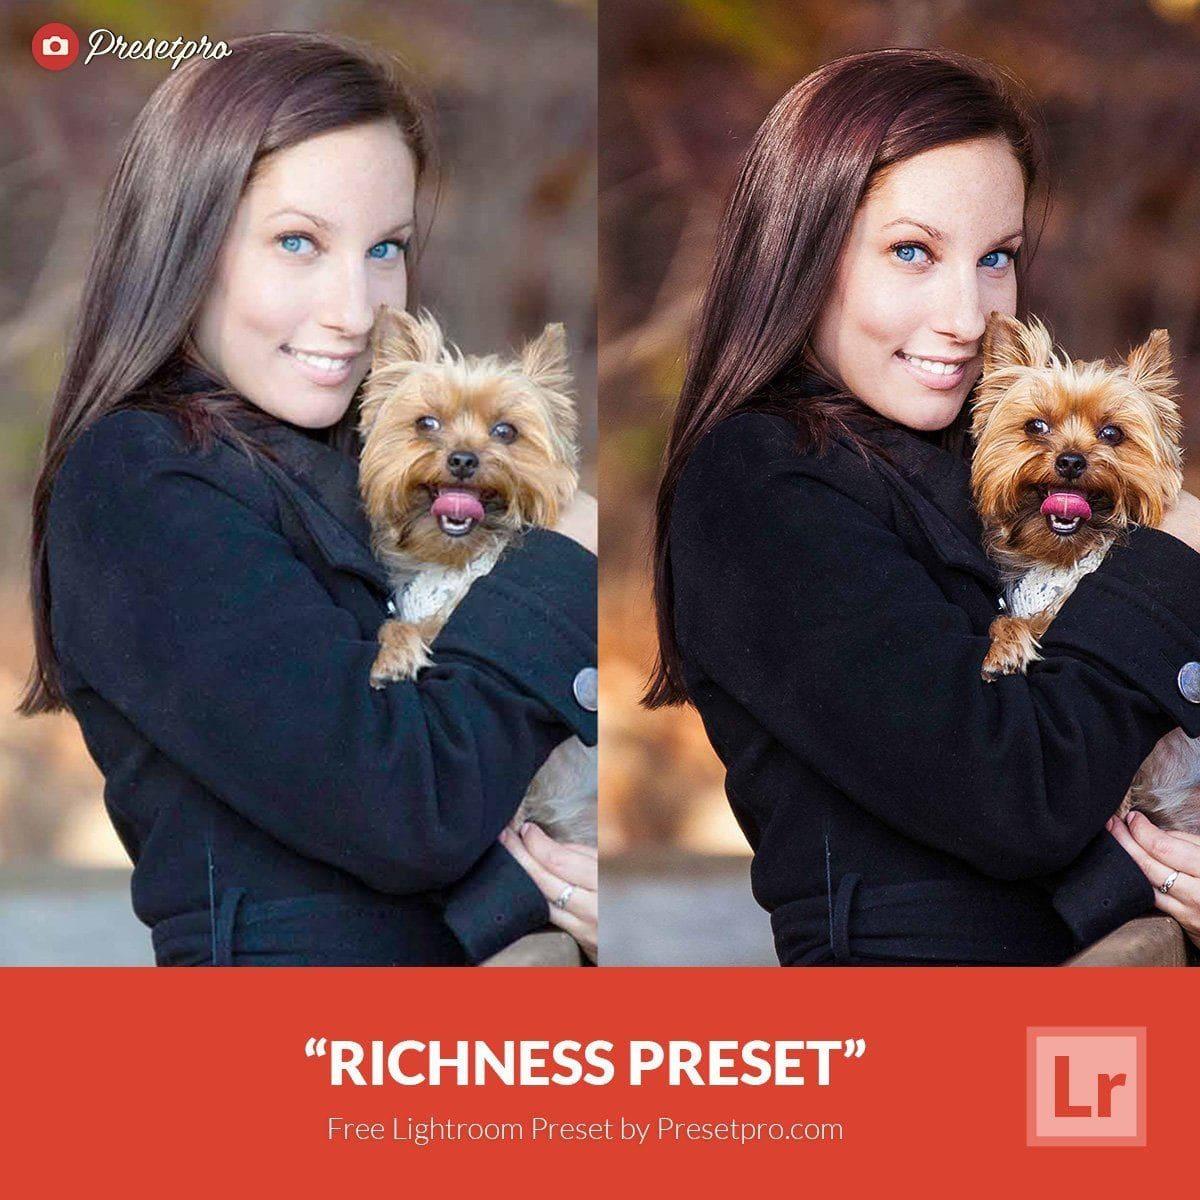 Free lightroom Preset Richness